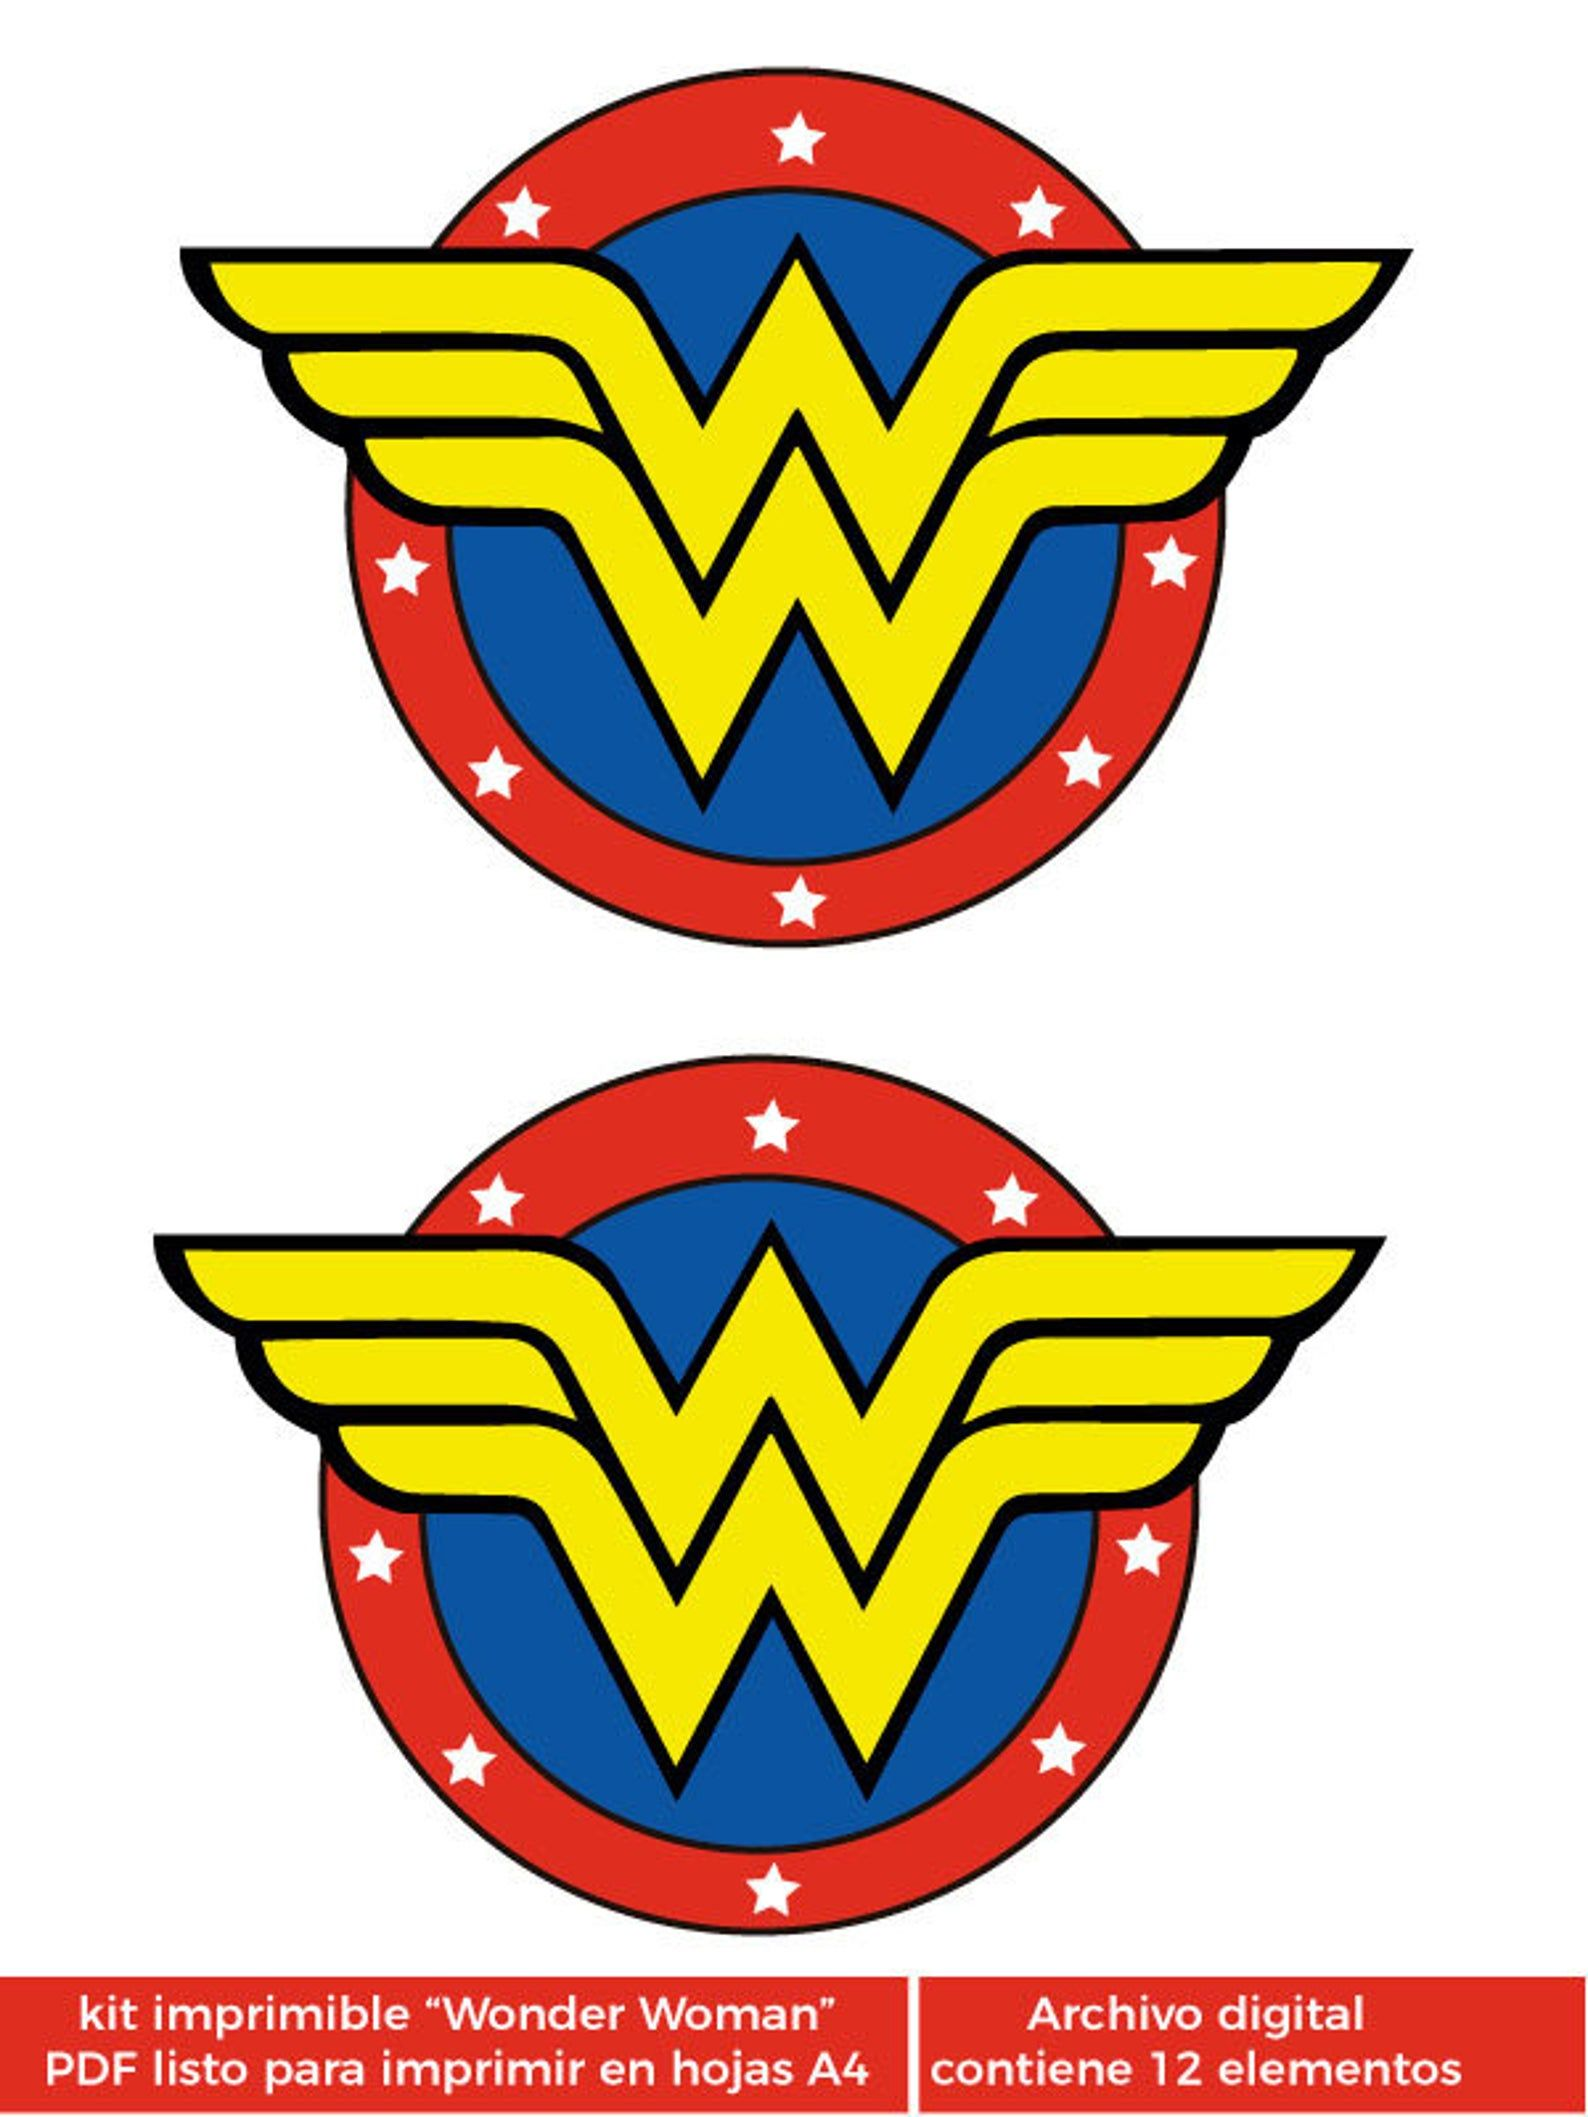 Wonder Woman Printable Kit Wonder Woman Pack For Birthday Etsy In 2020 Wonder Woman Birthday Wonder Woman Birthday Party Wonder Woman Party